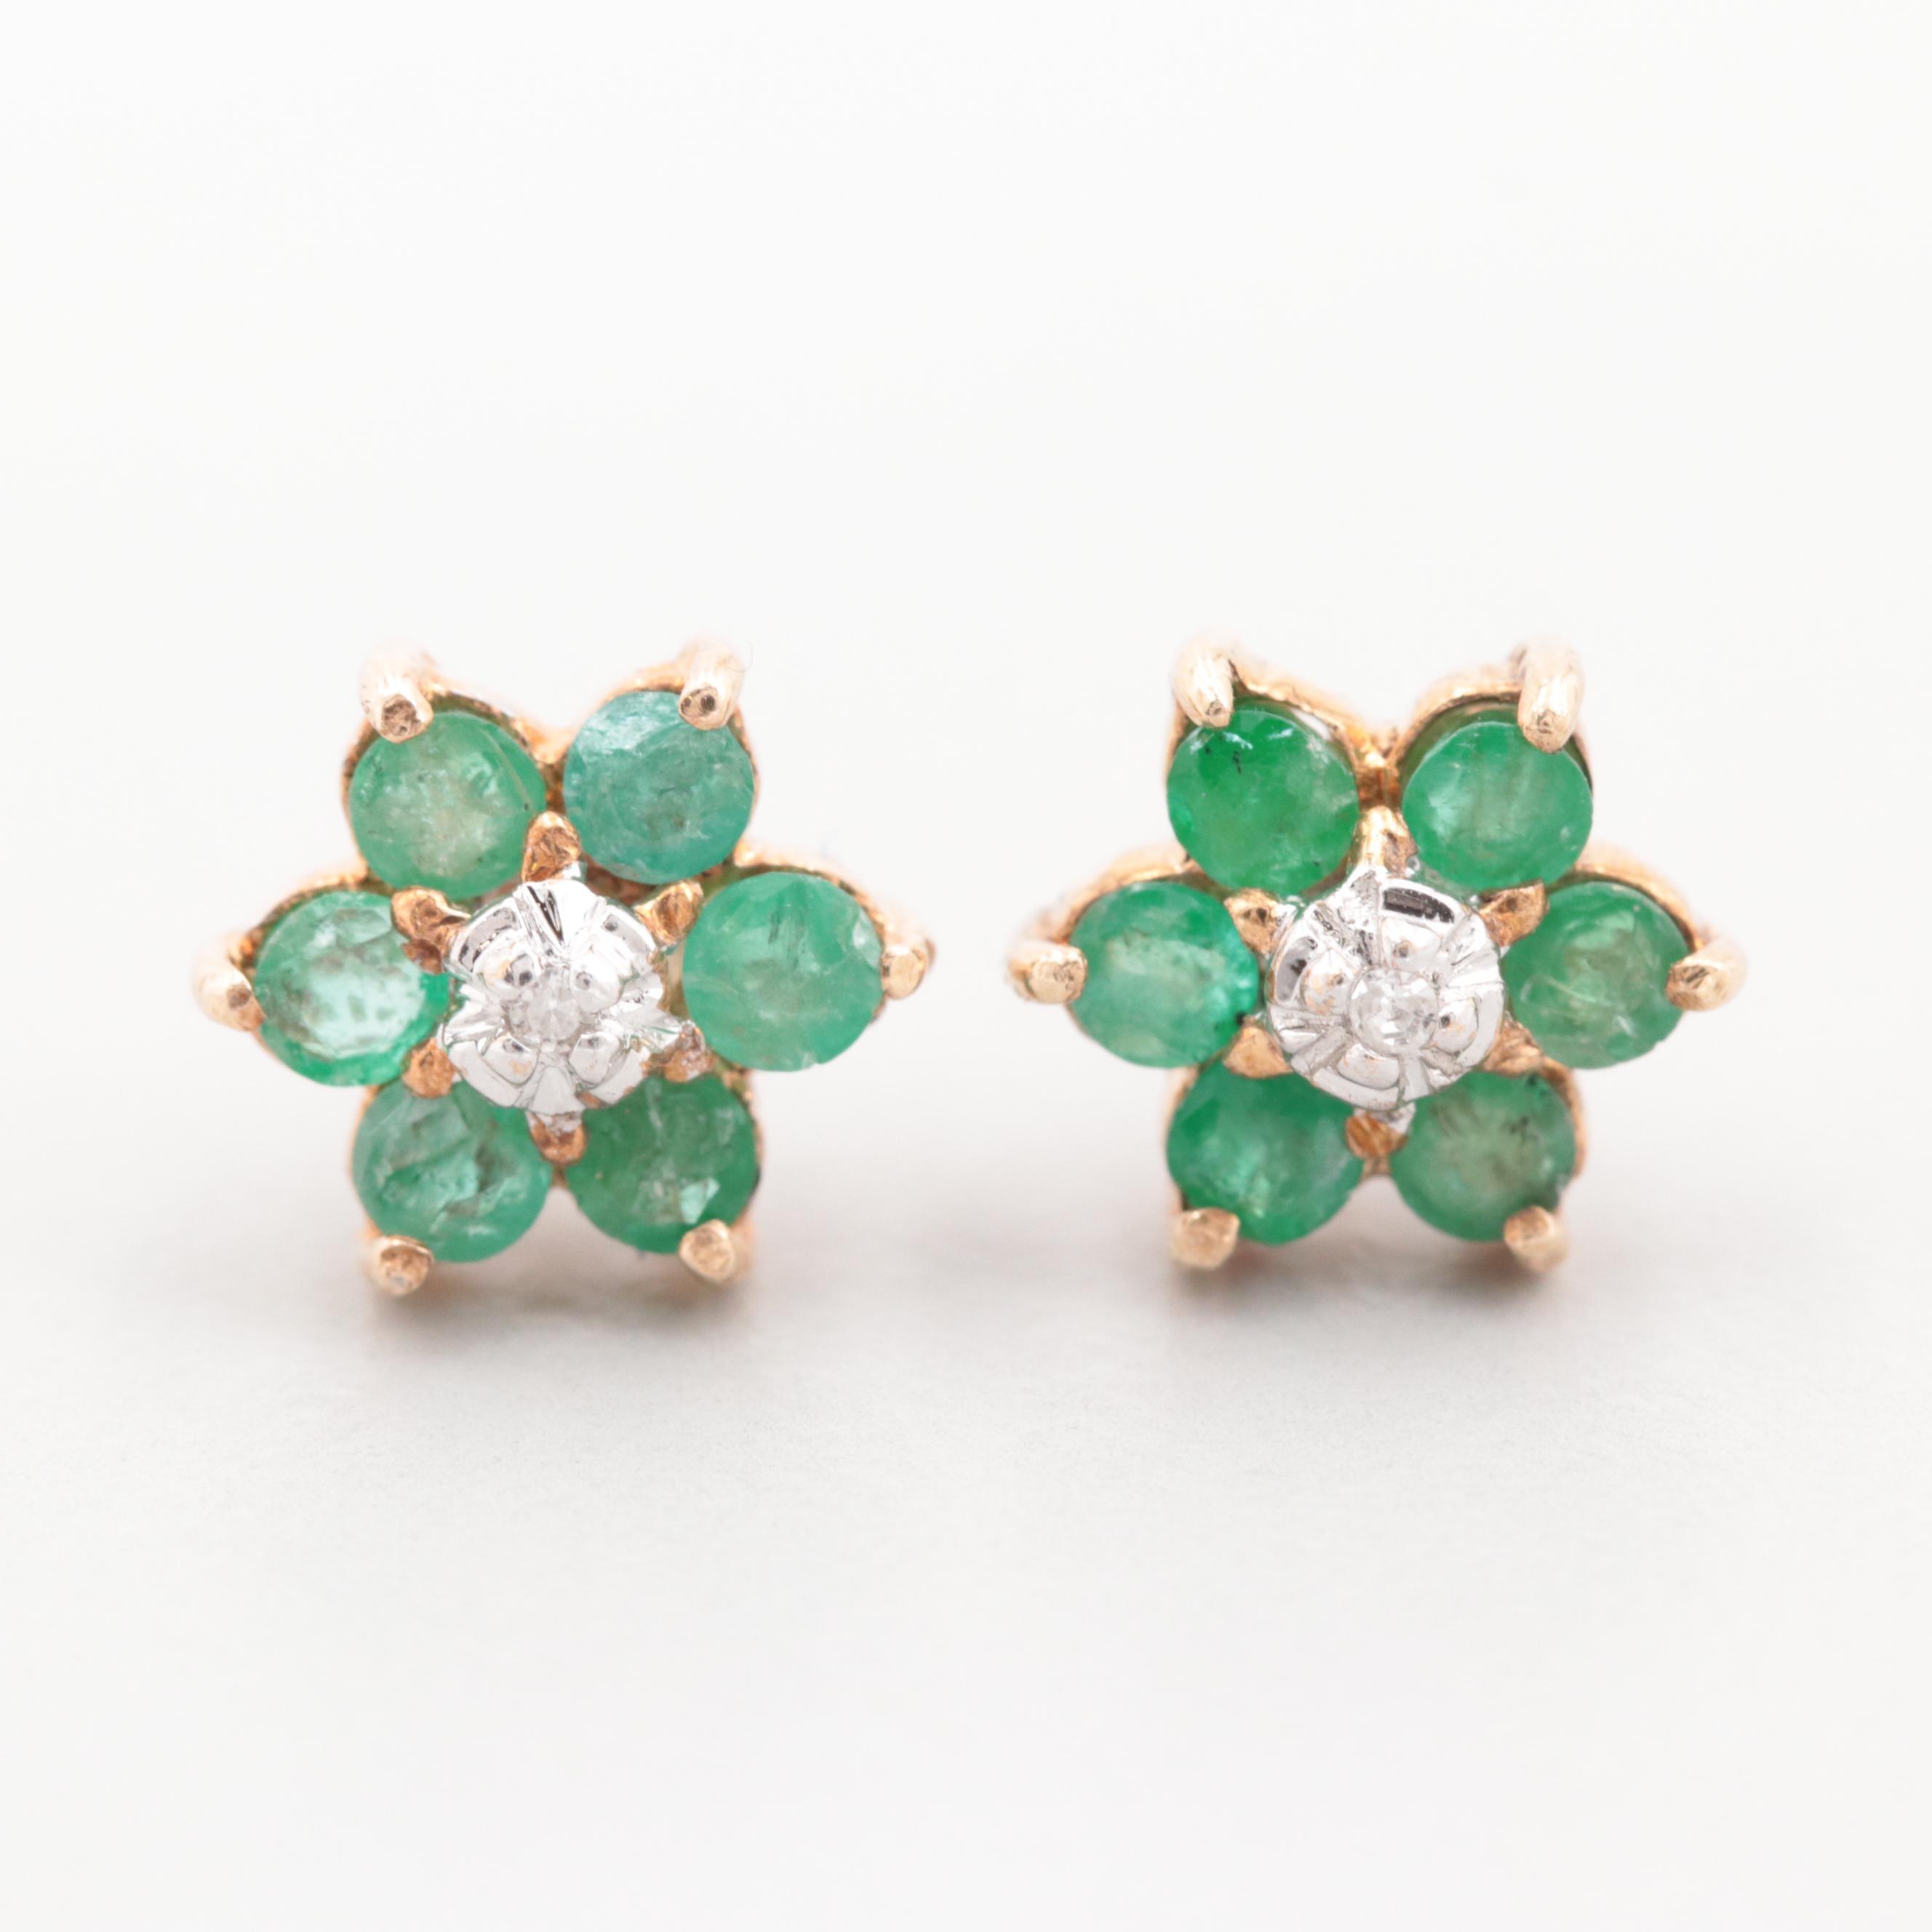 10K Yellow Gold Diamond and Emerald Stud Earrings